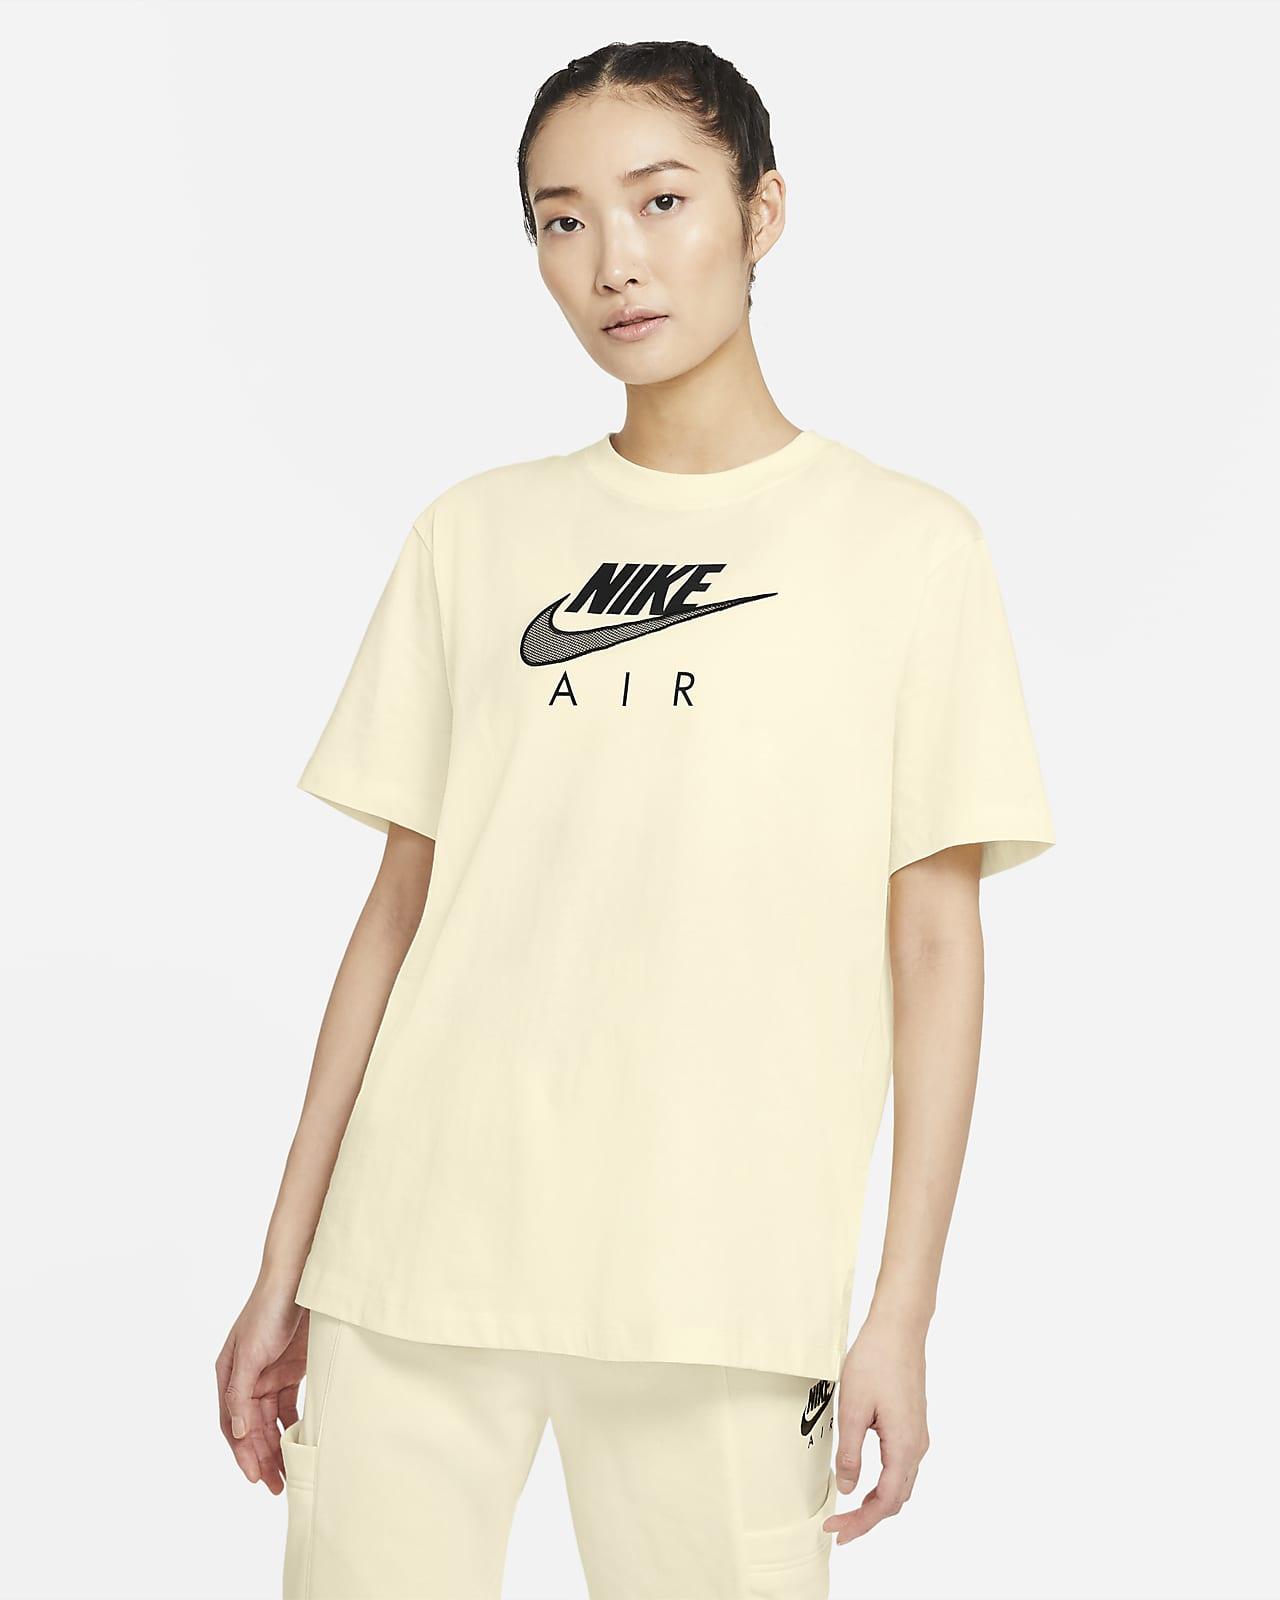 Nike Air Women's Boyfriend Top